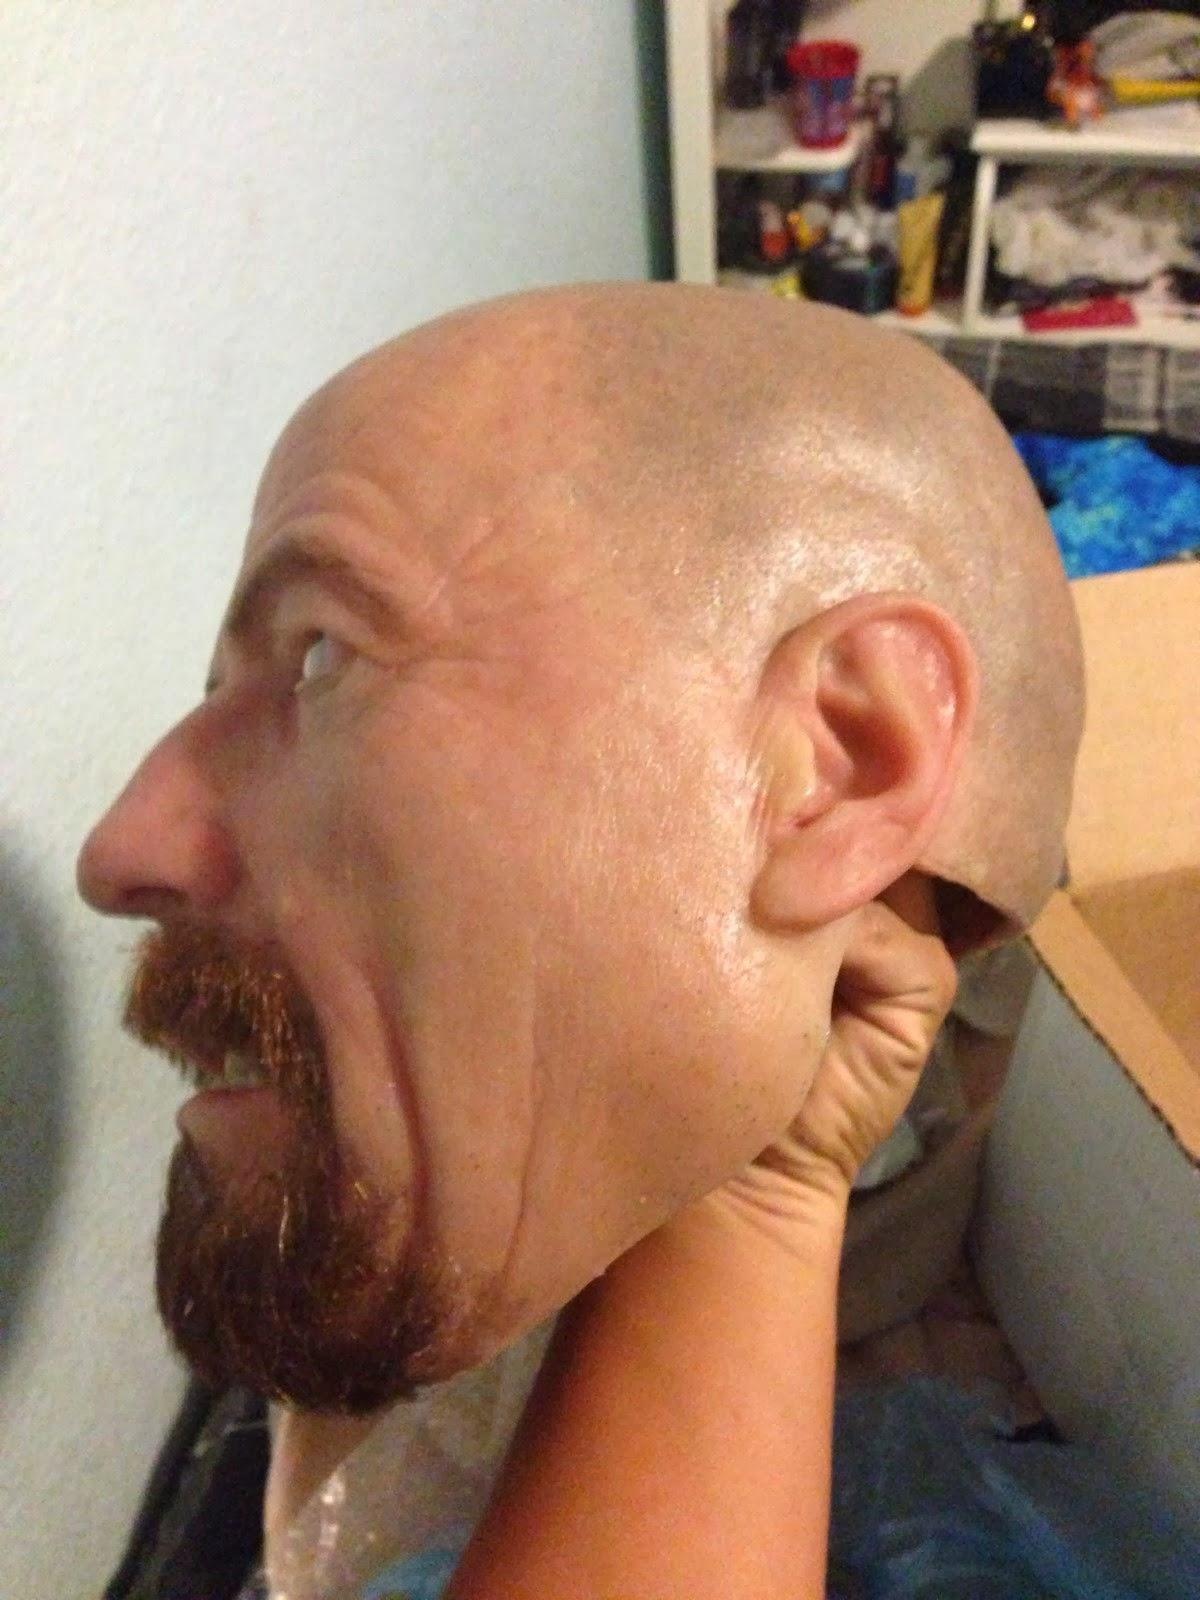 BREAKING BAD : BREAKING BAD - Walter White Mask ' #3 (2013)